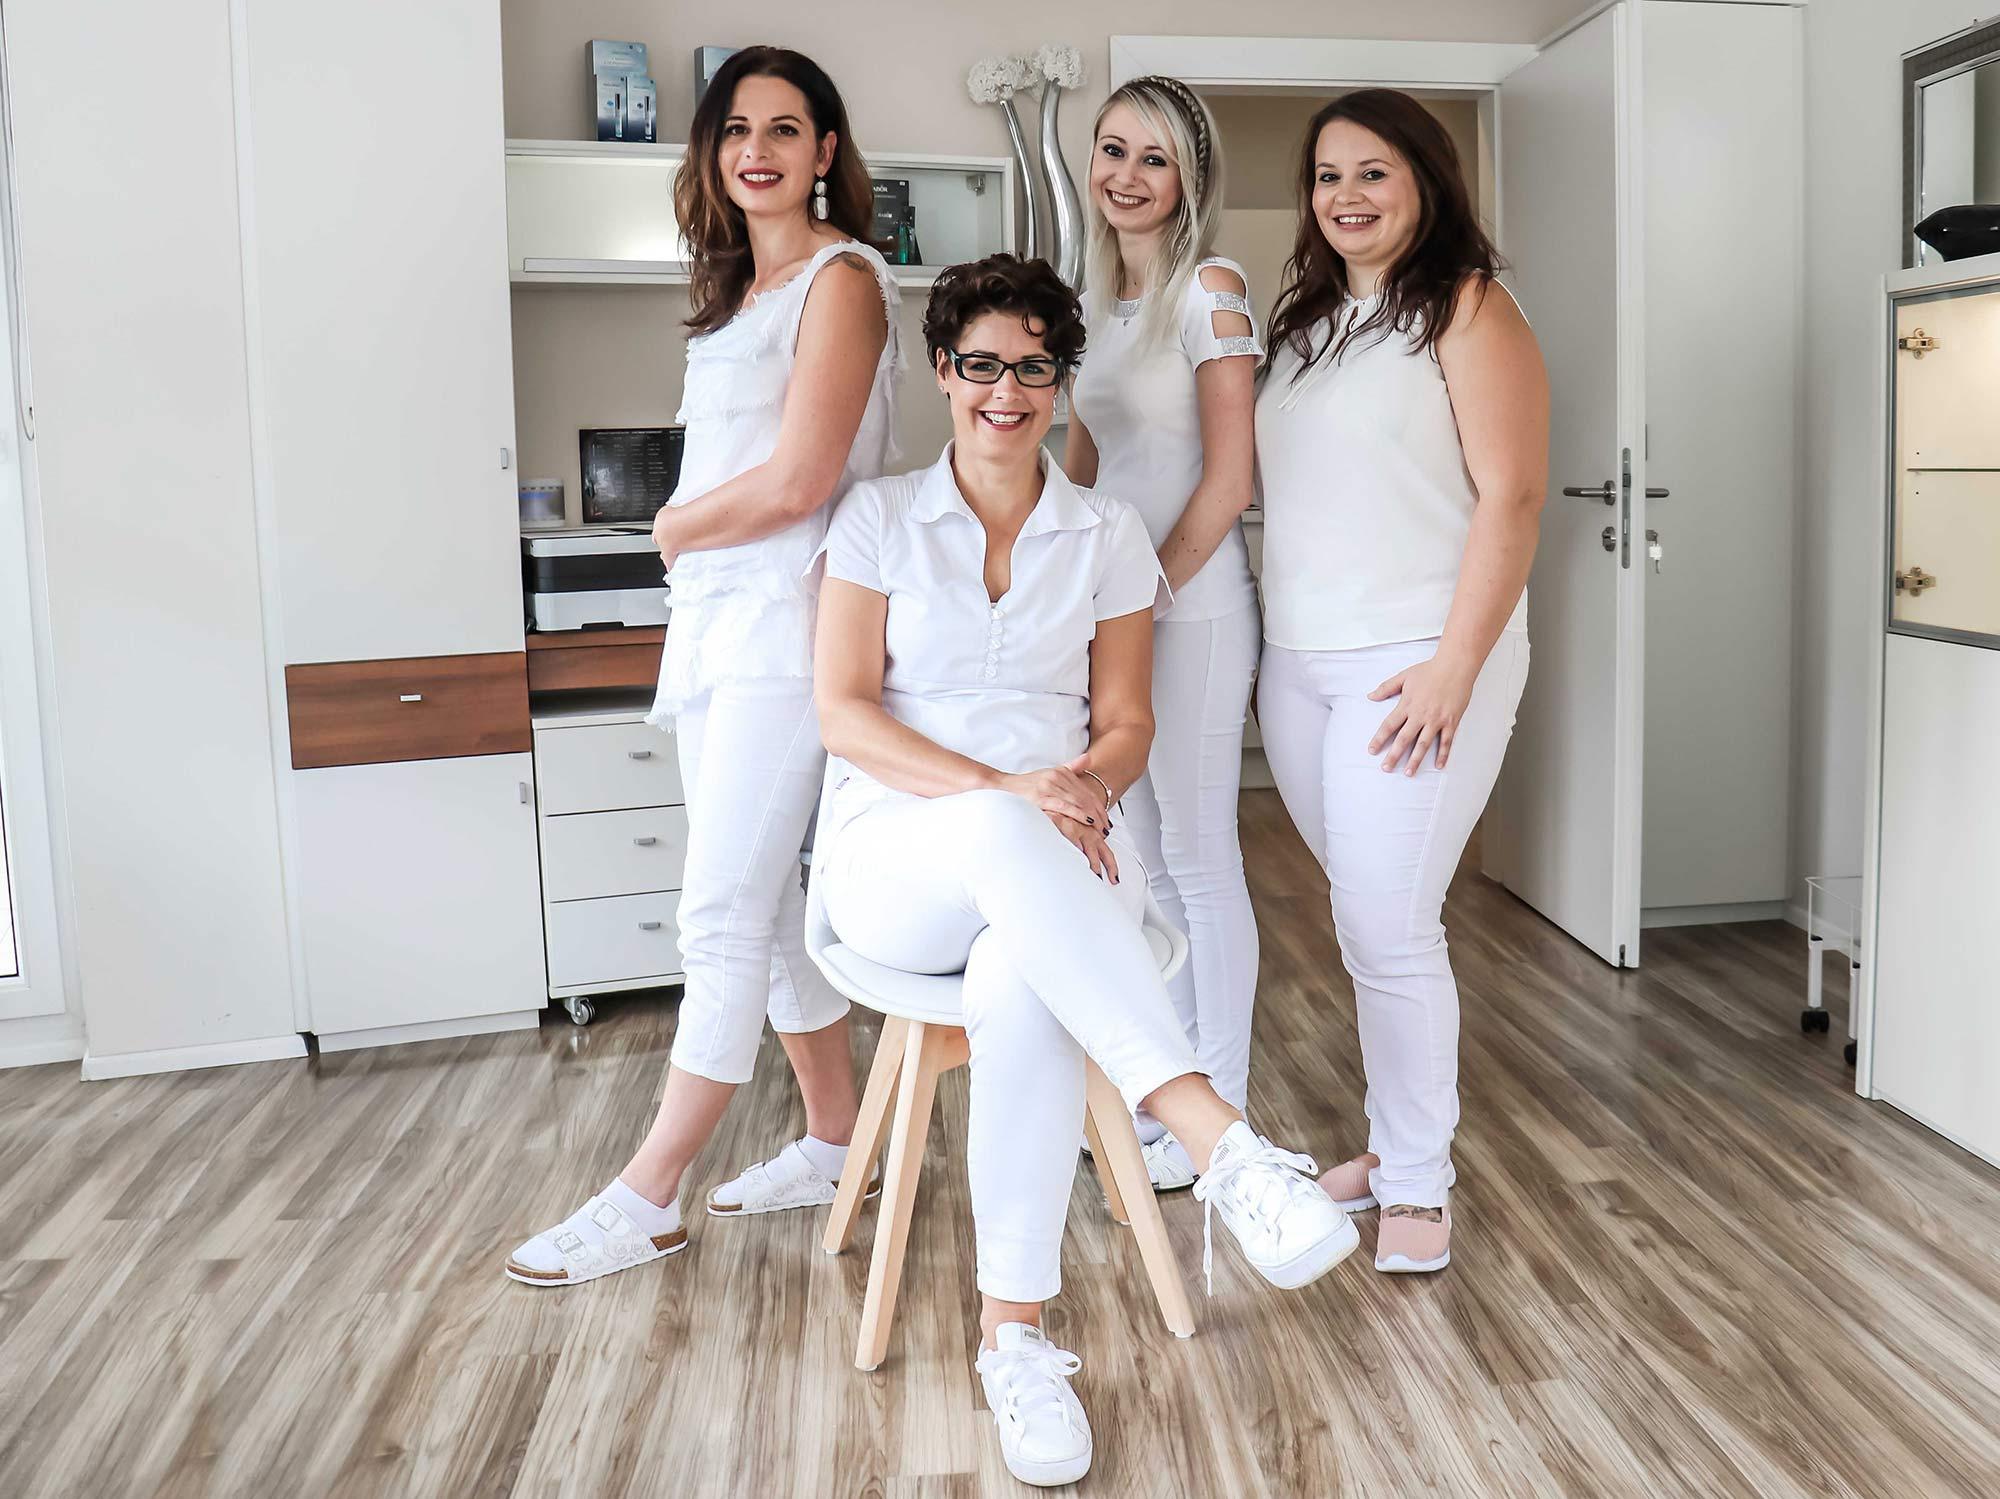 kosmetik-katrin-hermagor-team